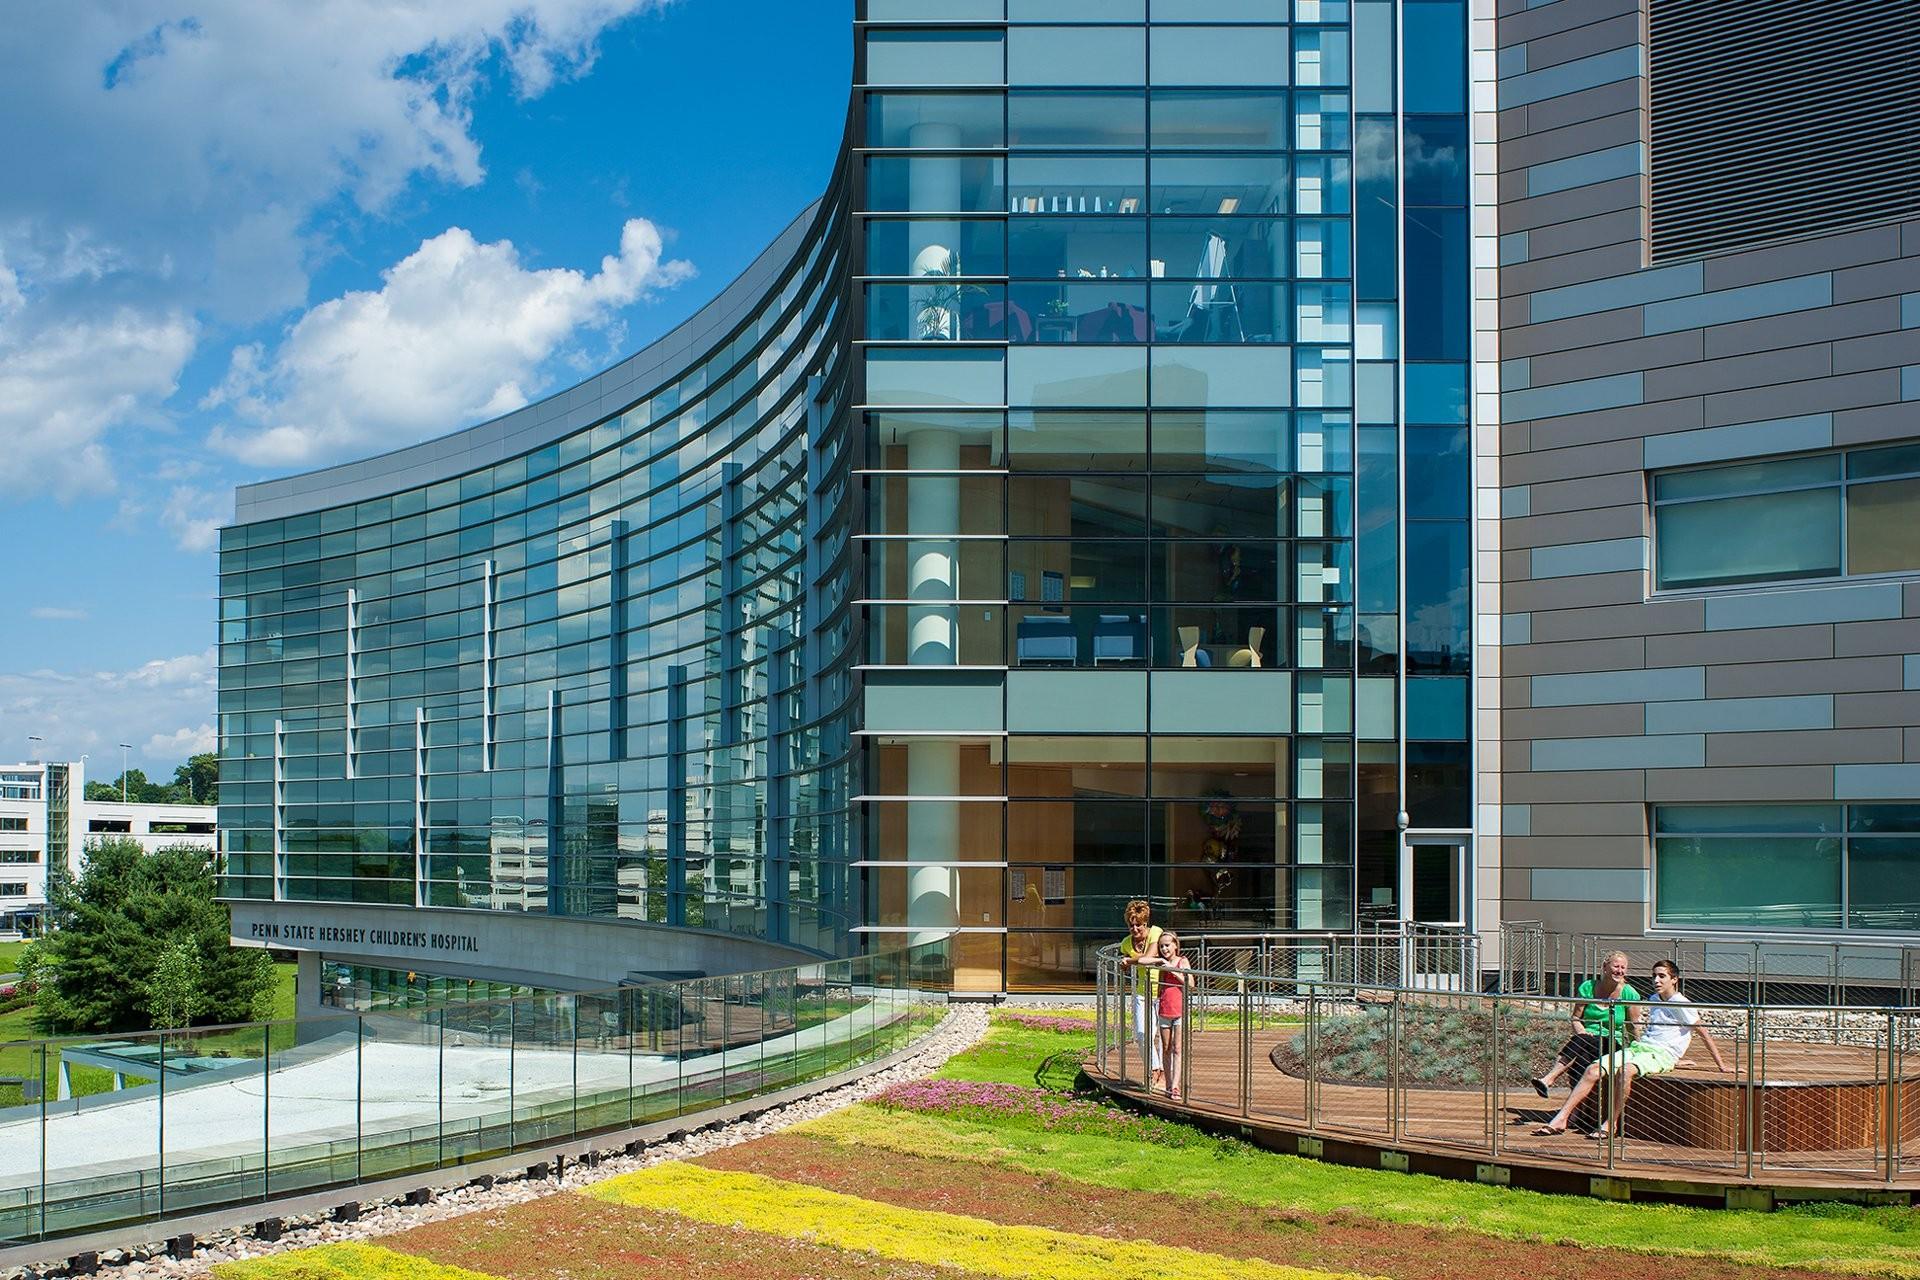 Penn State Hershey Clinical Quadrangle Master Plan